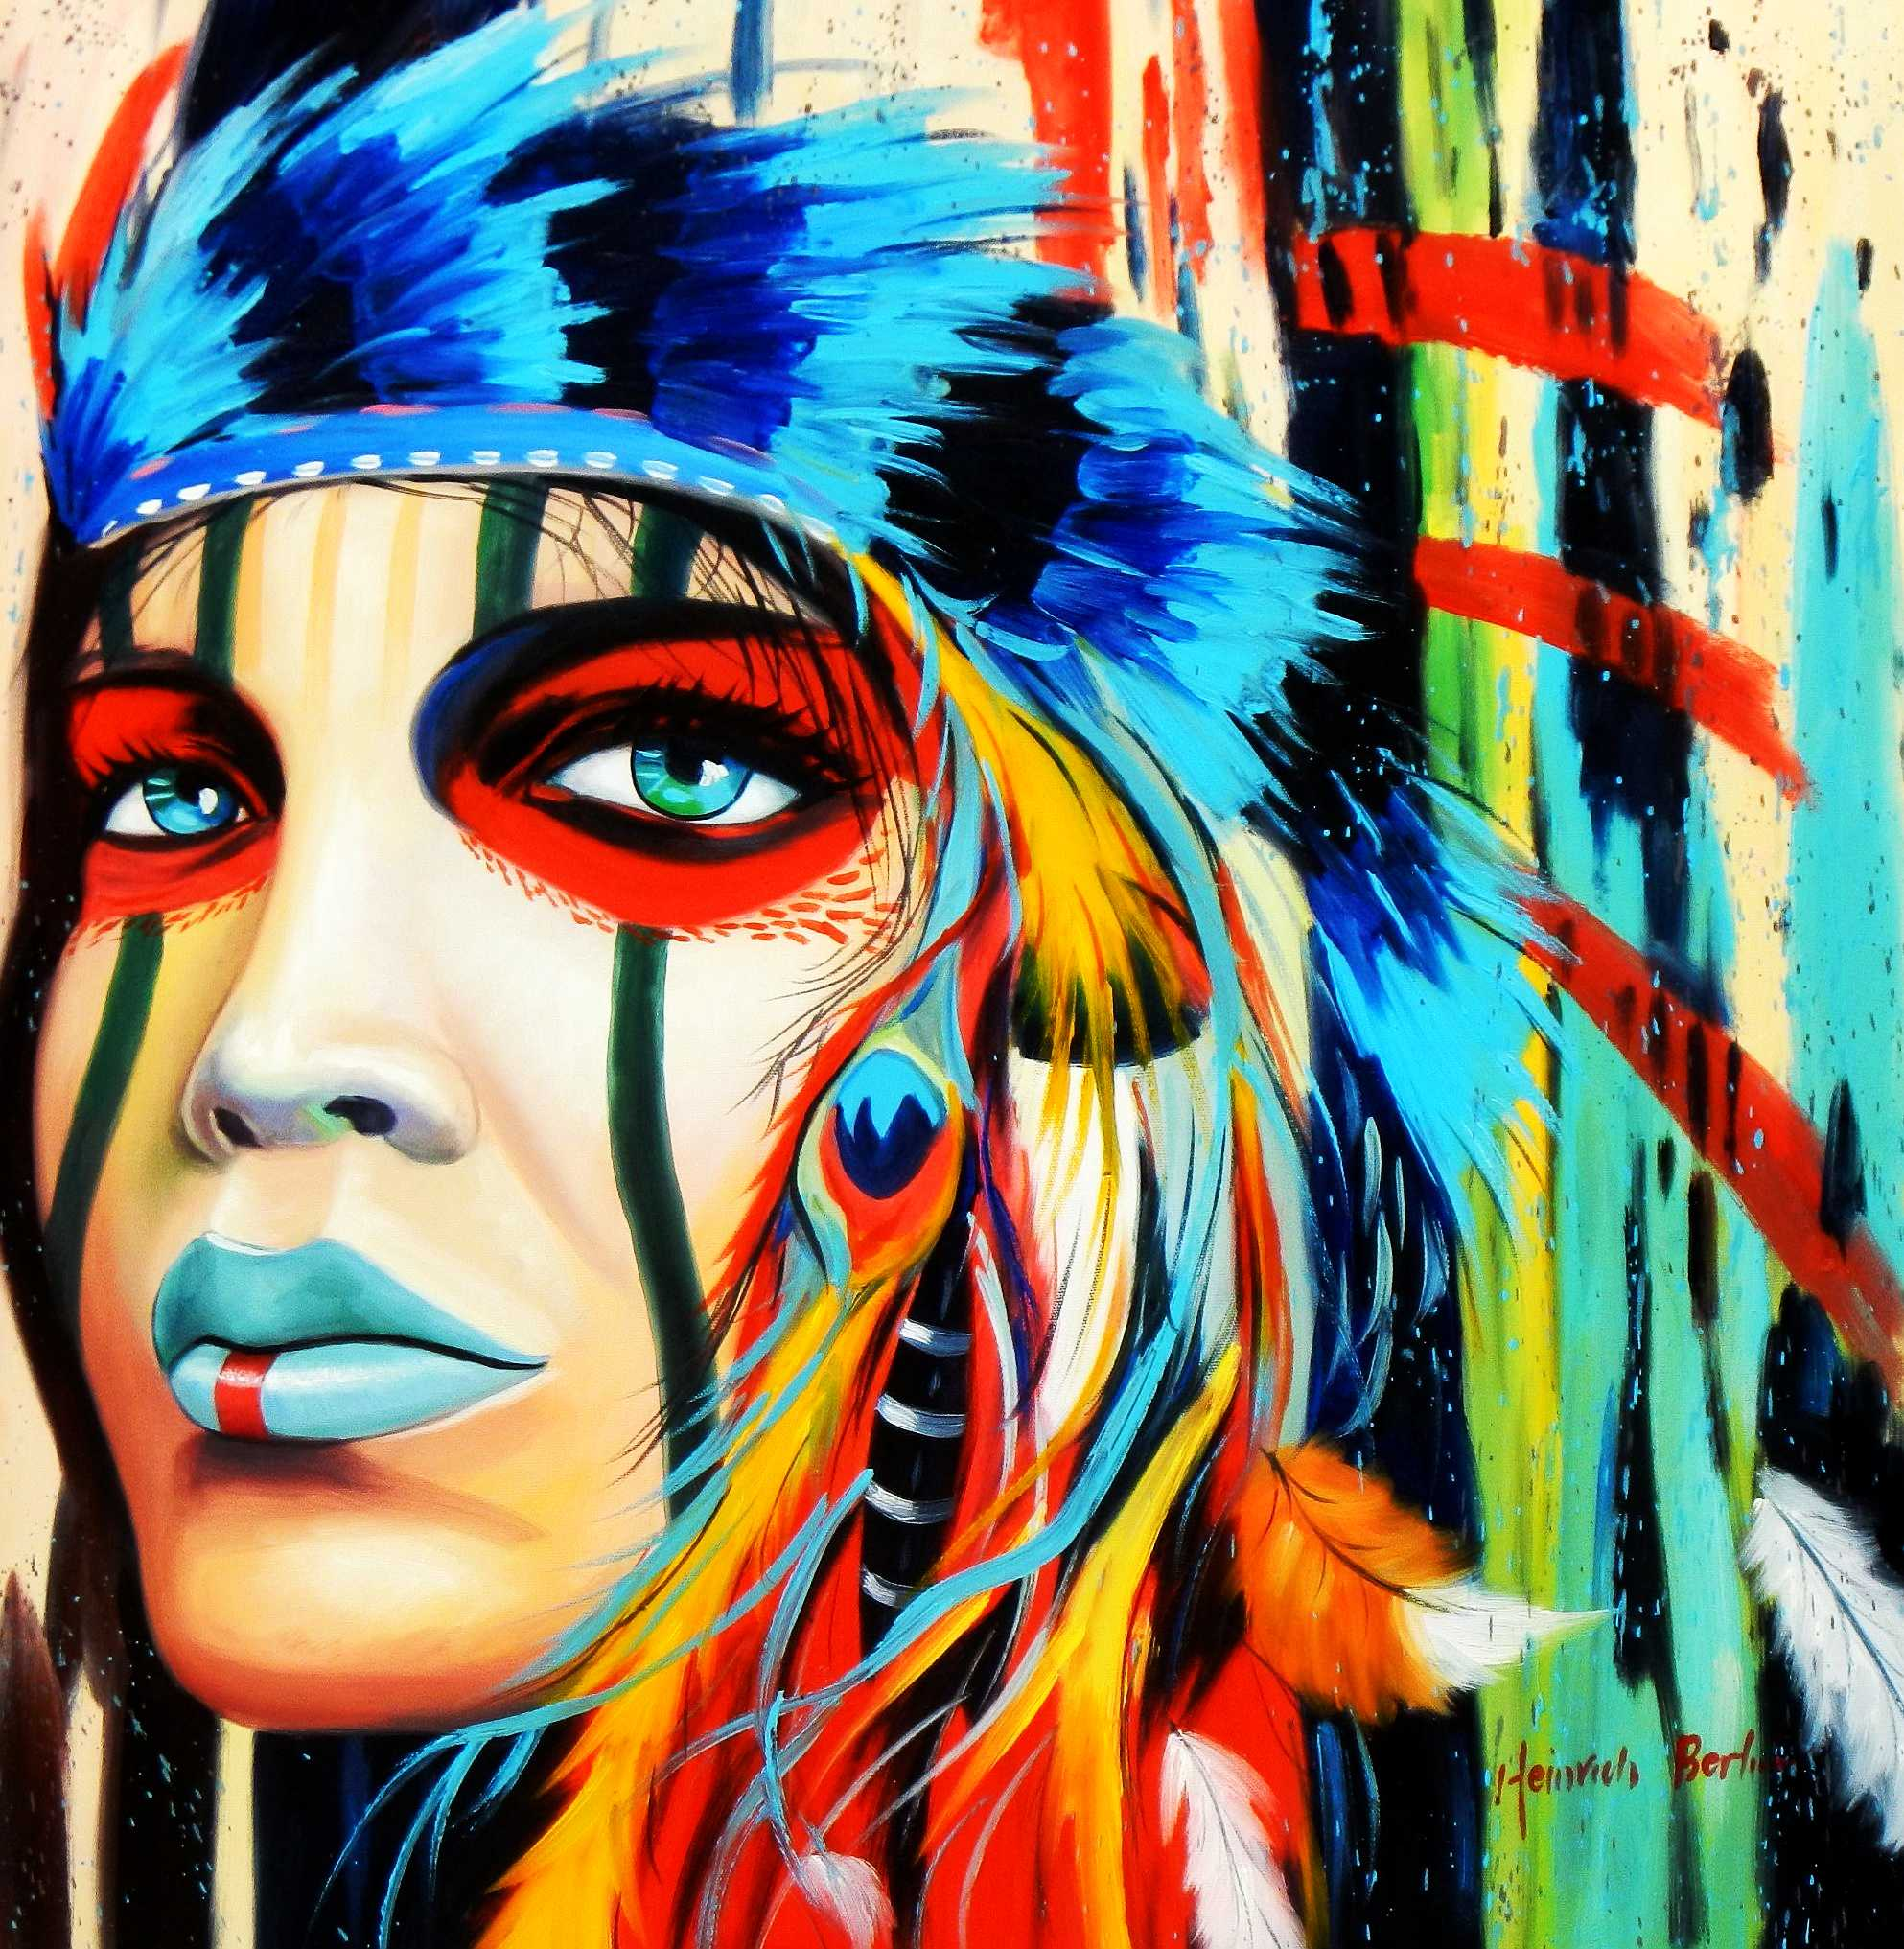 Modern Art - Grand Cherokee e95210 60x60cm exzellentes Ölgemälde